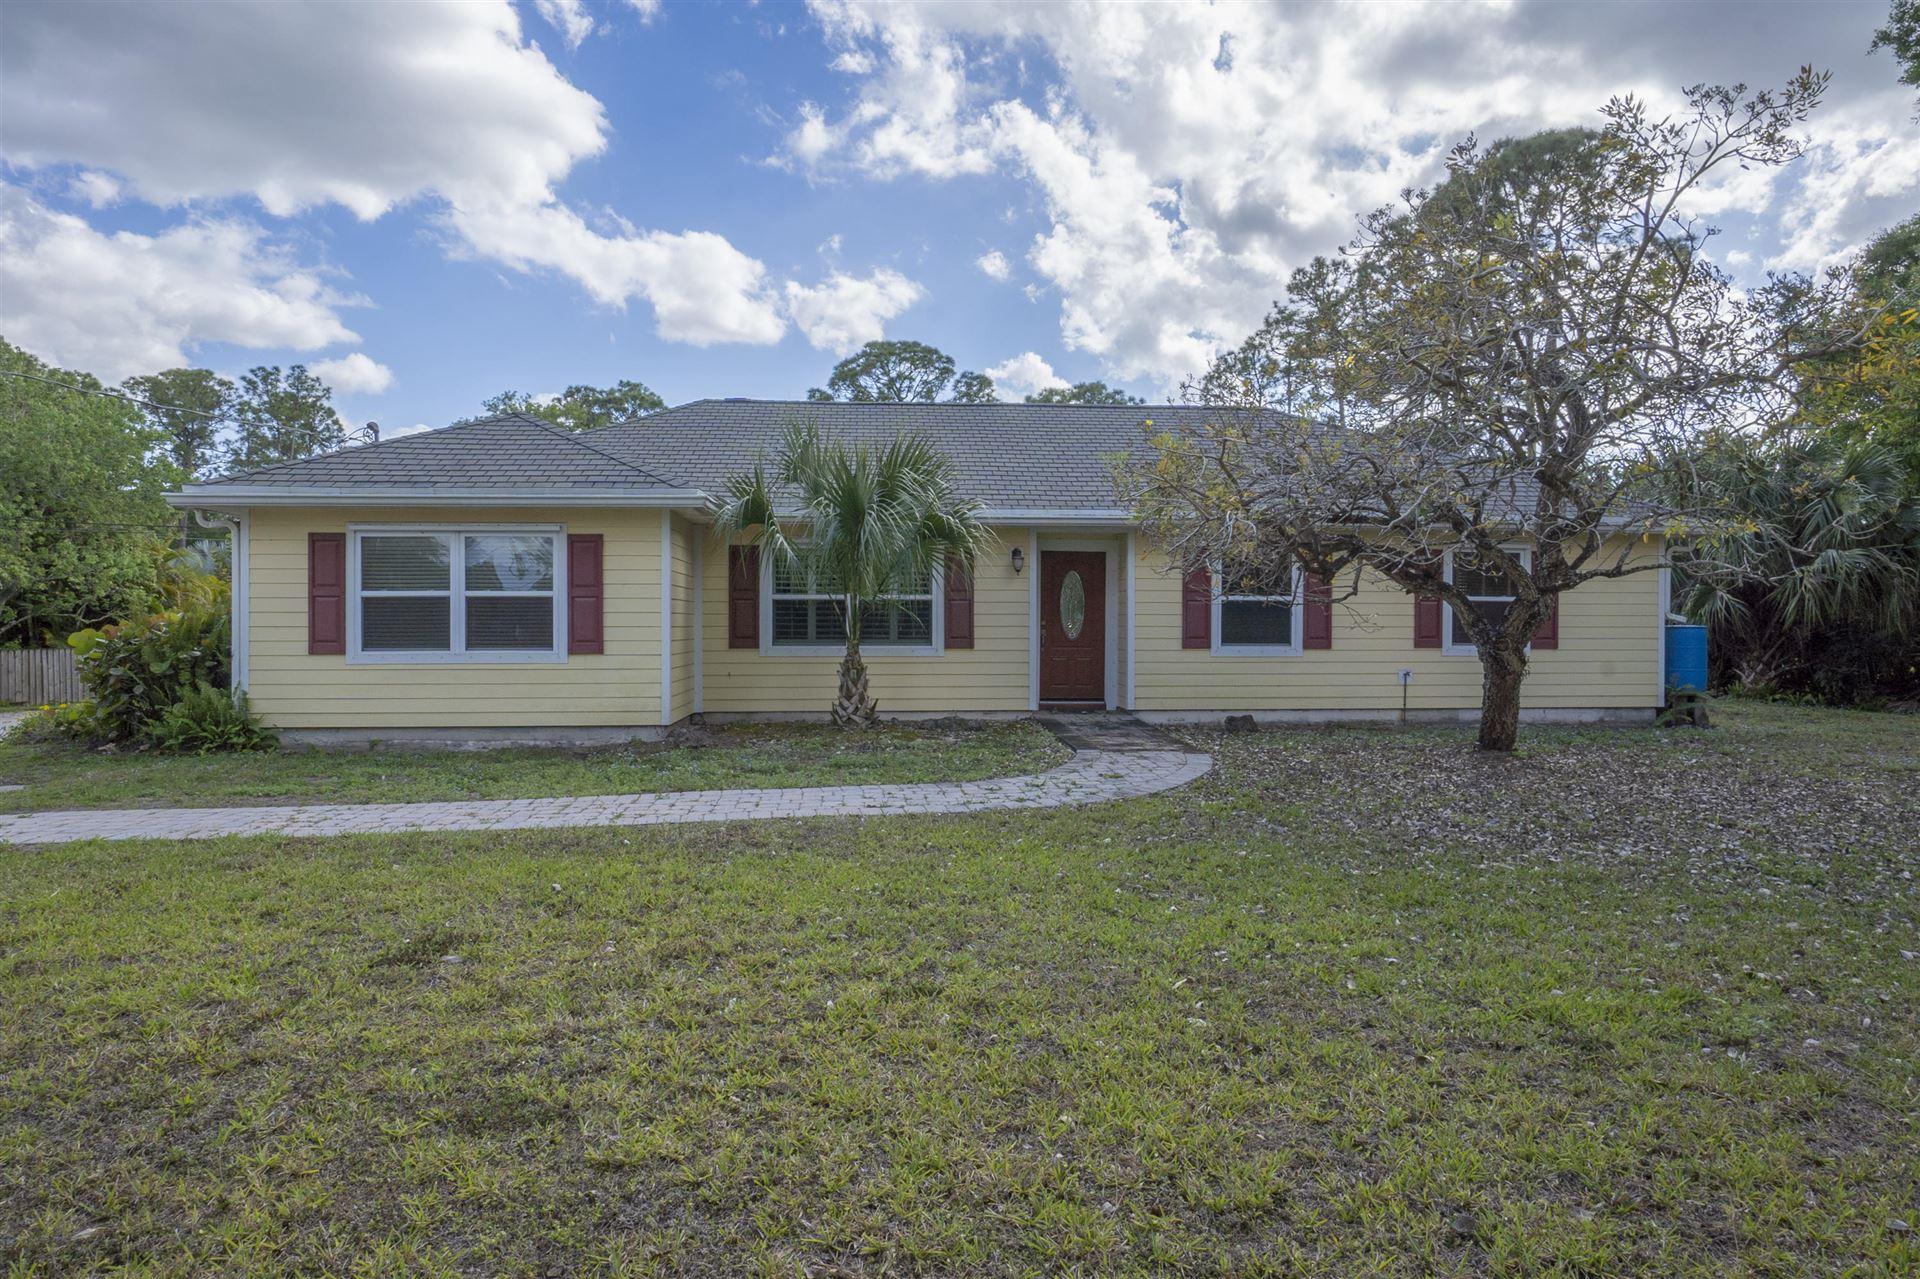 Photo of 11266 159th Ct. N Court N, Jupiter, FL 33478 (MLS # RX-10697192)